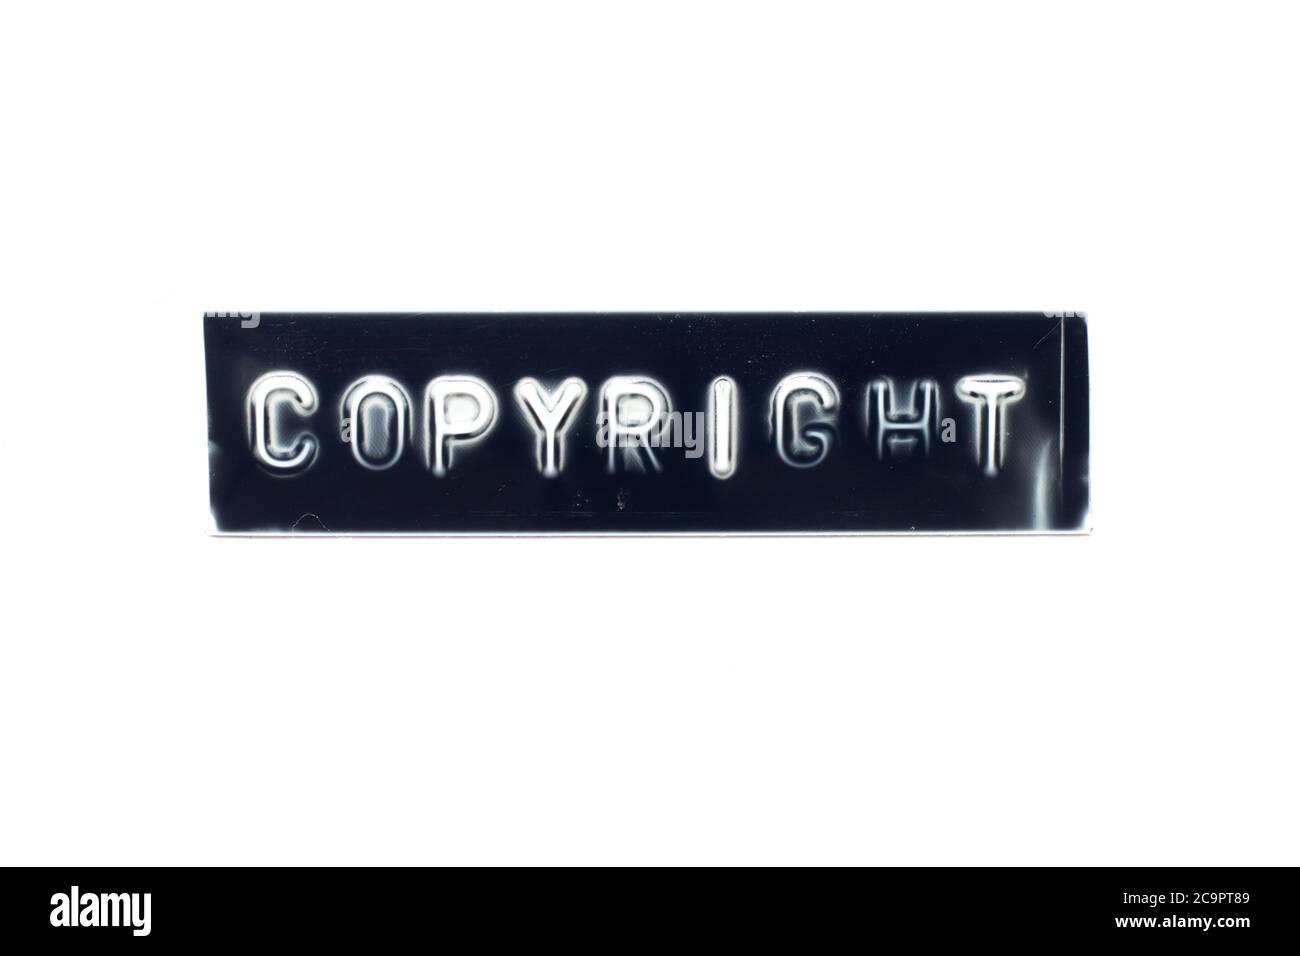 Letra en relieve en palabra copyright sobre banner negro con fondo blanco Foto de stock